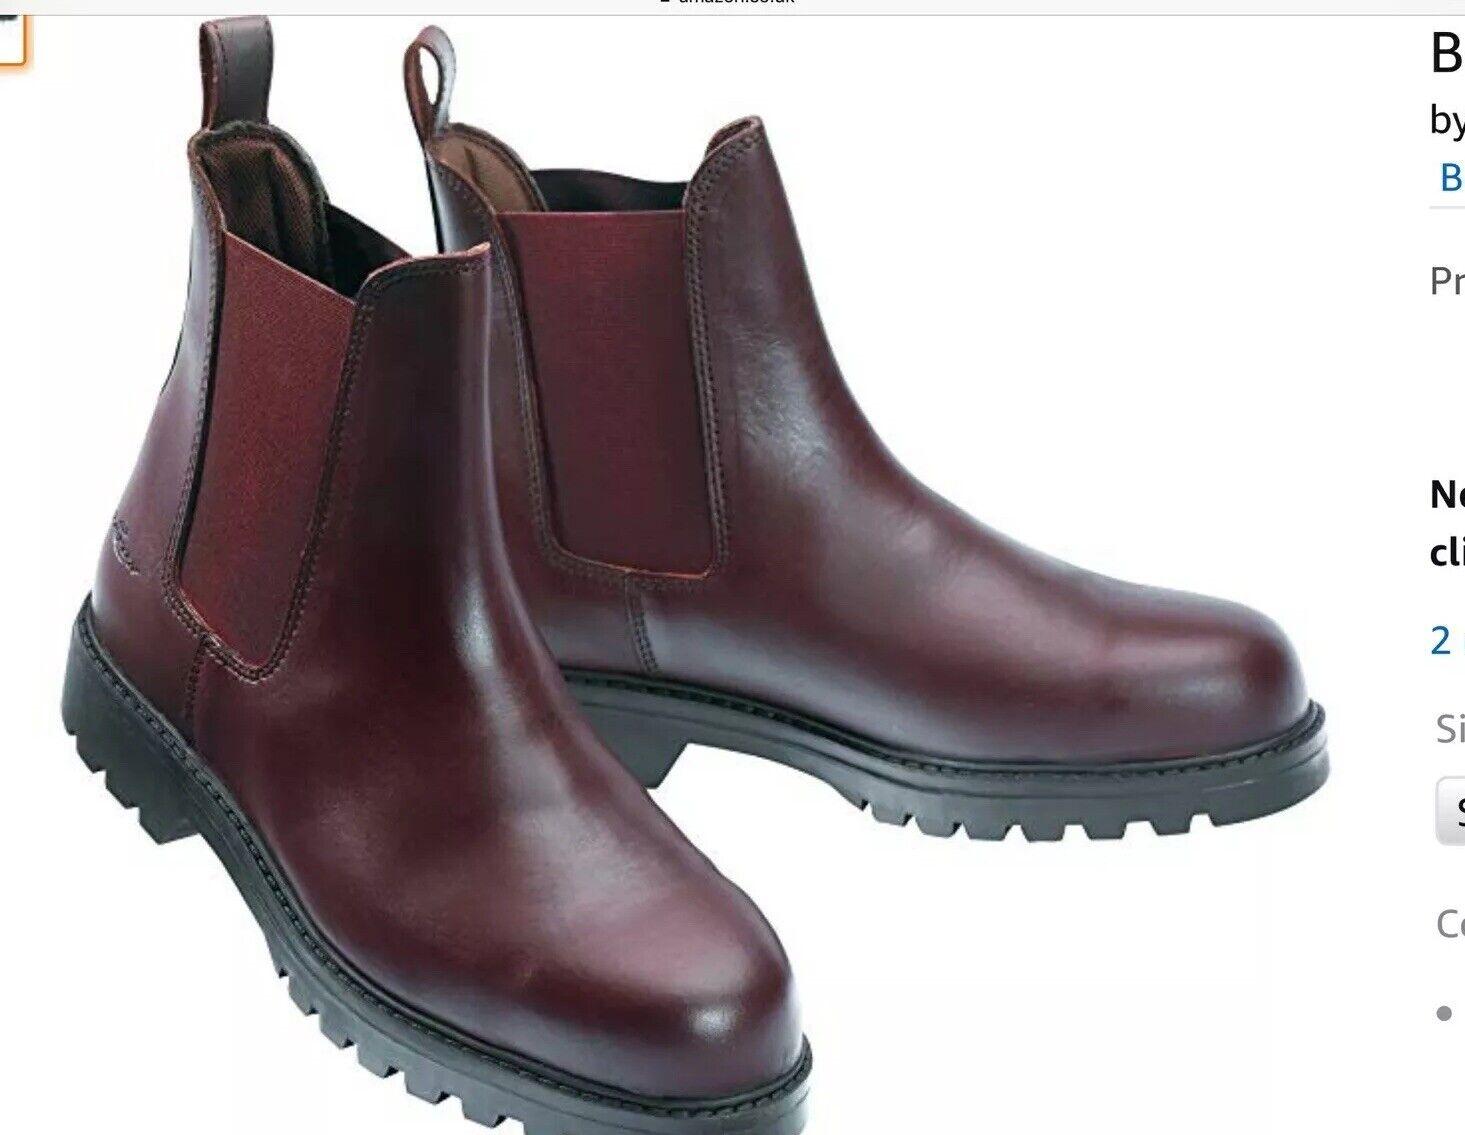 Brown Leather Norton Steel Toe Safety Jodphur Boots Size 7 Euro